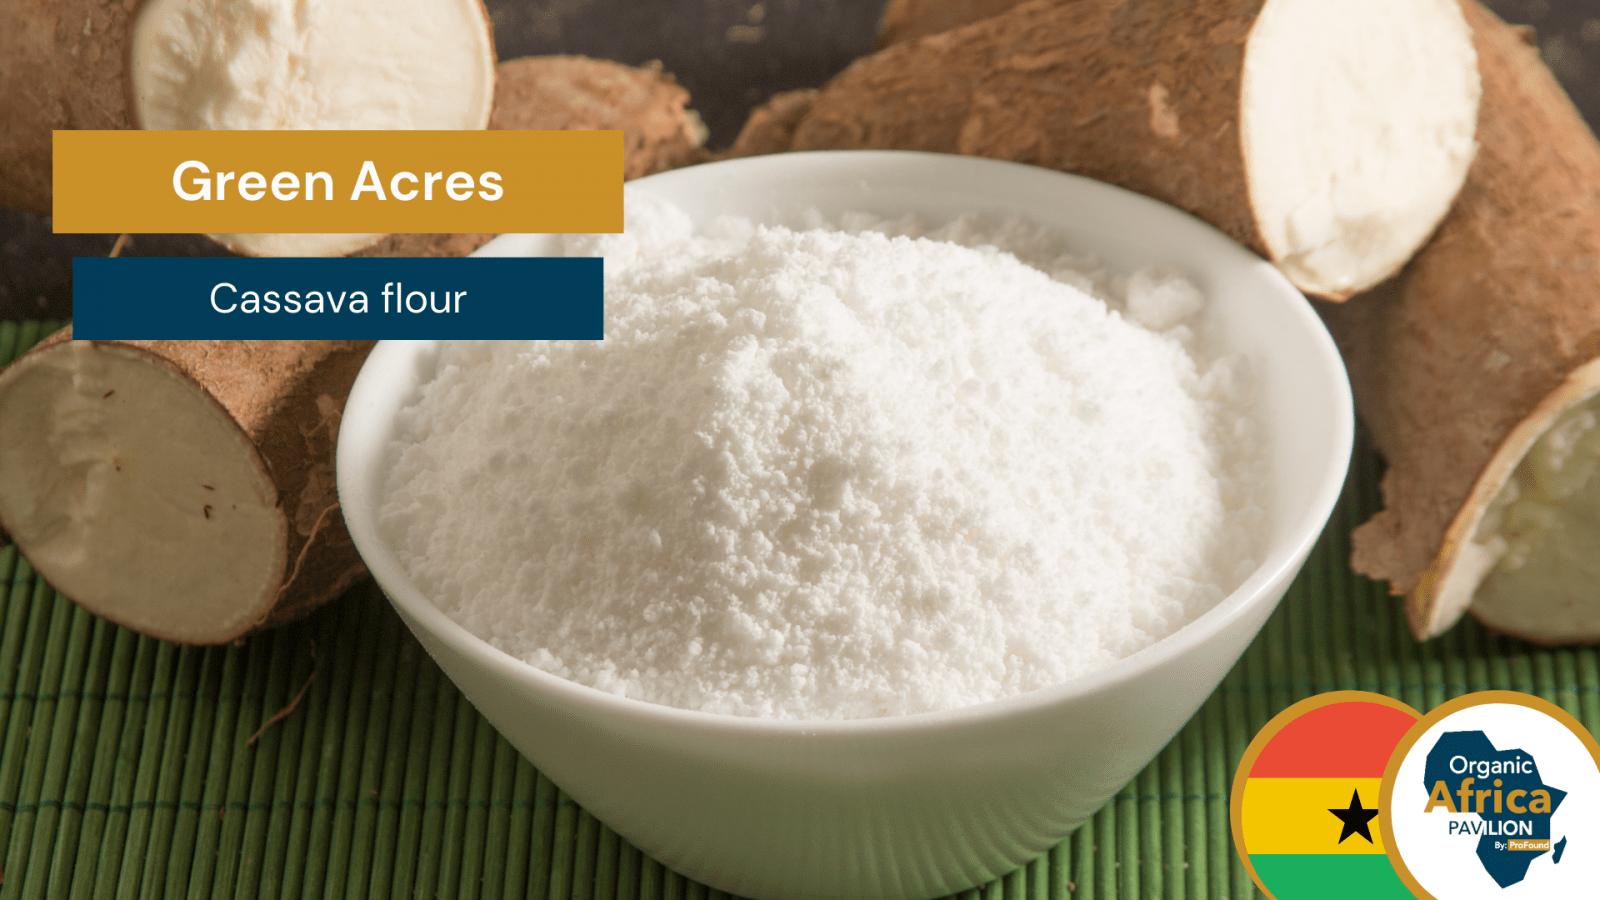 Green acres Profound cassava flour